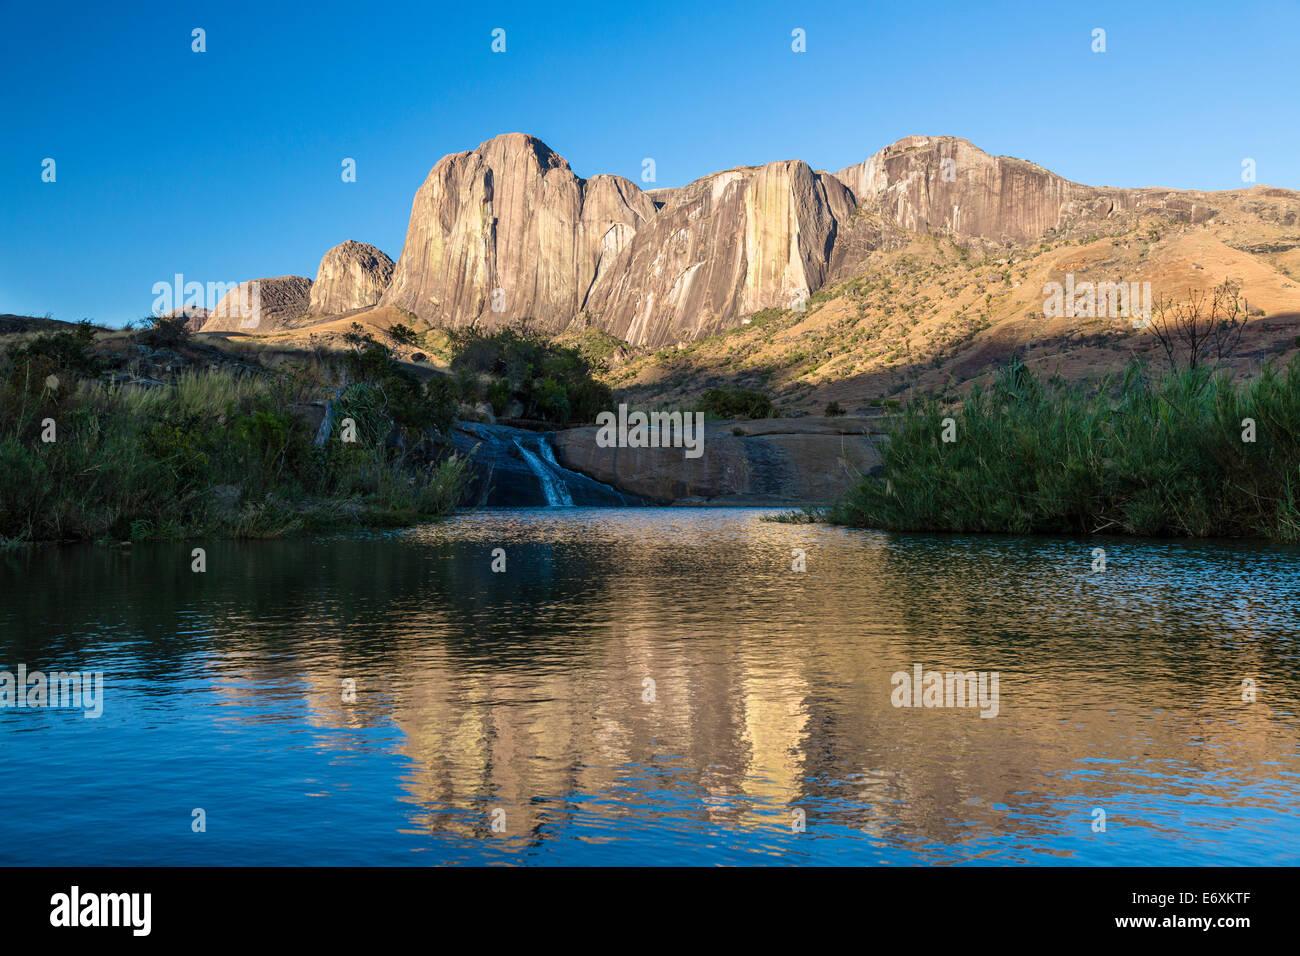 Tsaranoro Massif with reflection, highlands, South Madagascar, Africa - Stock Image